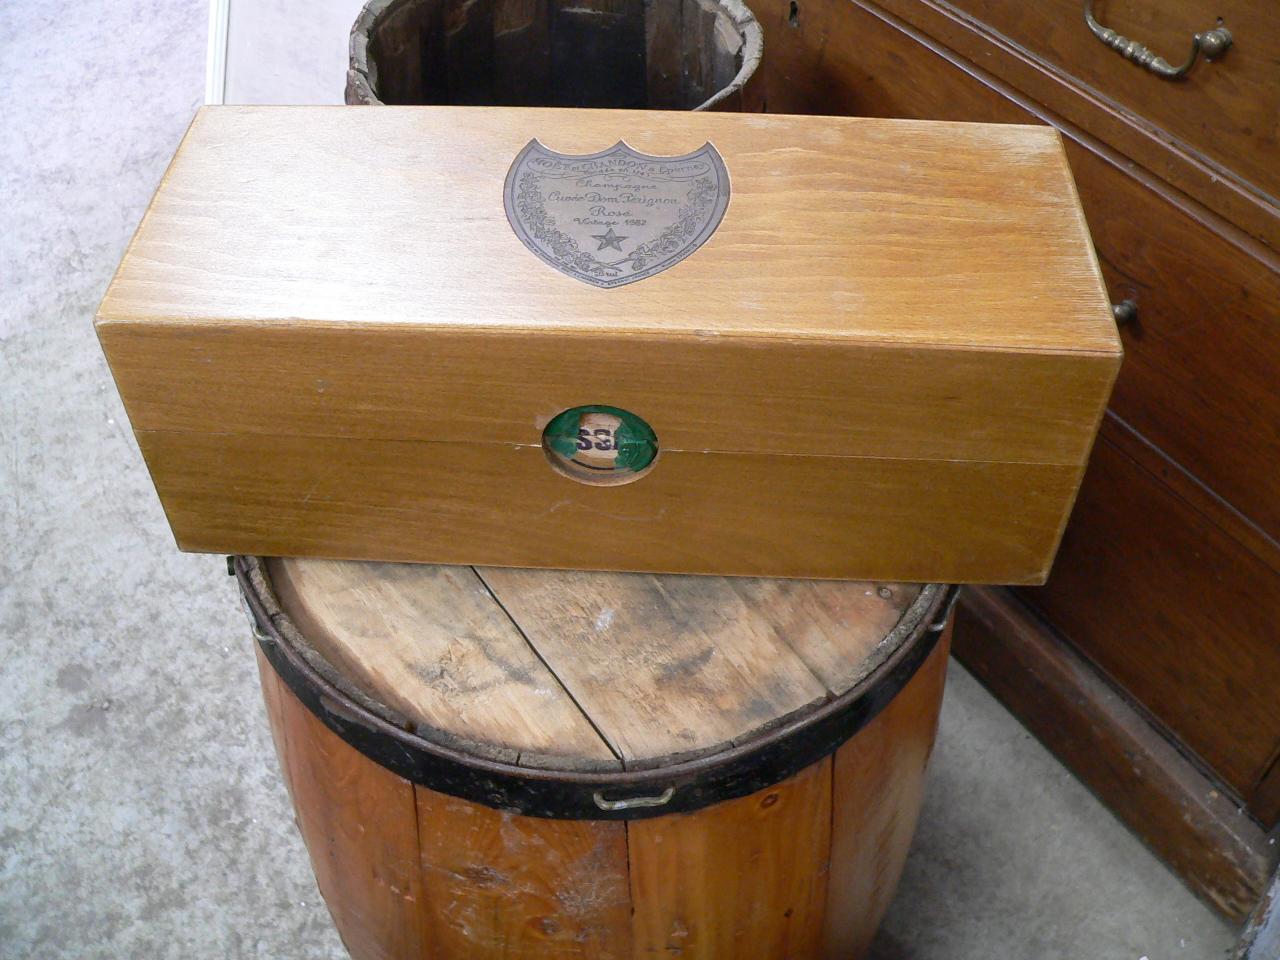 Boite de bois dom pérignon # 4909